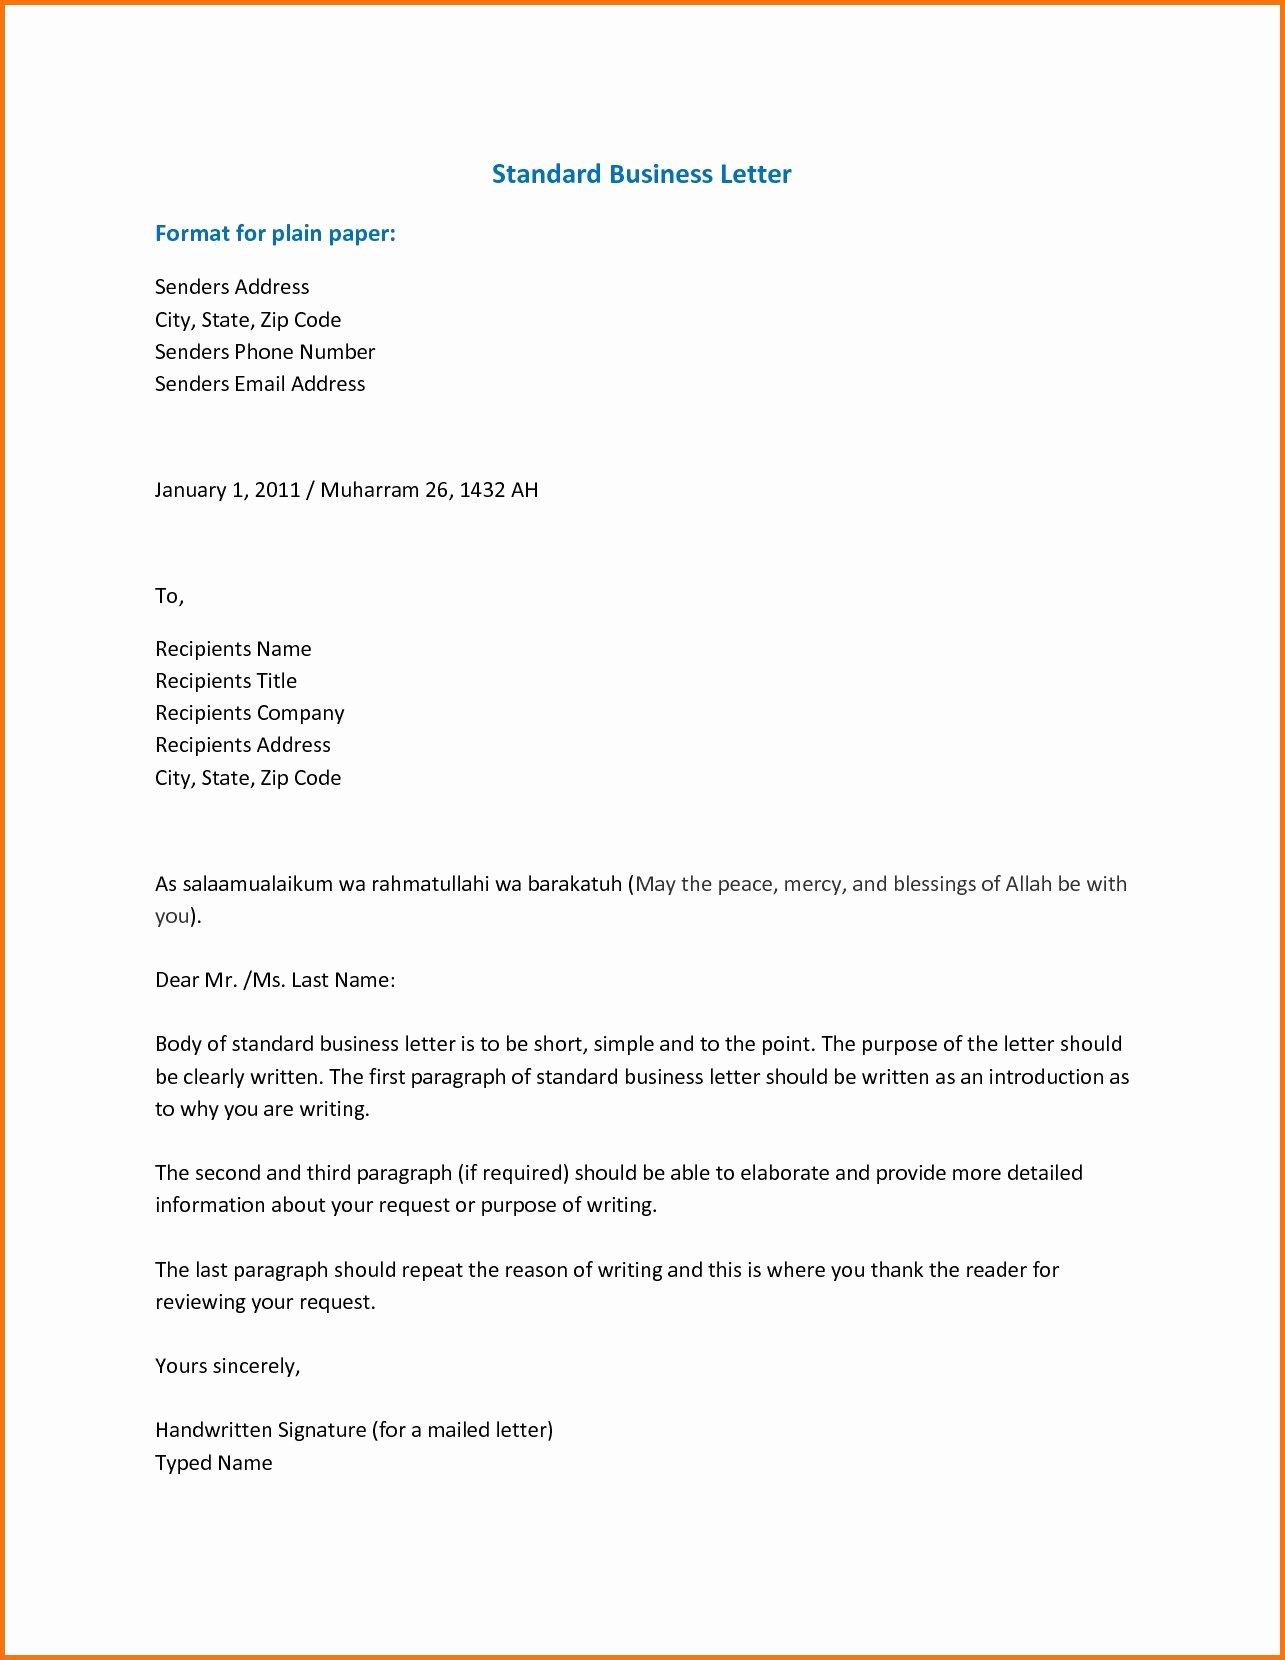 Standard Business Letter